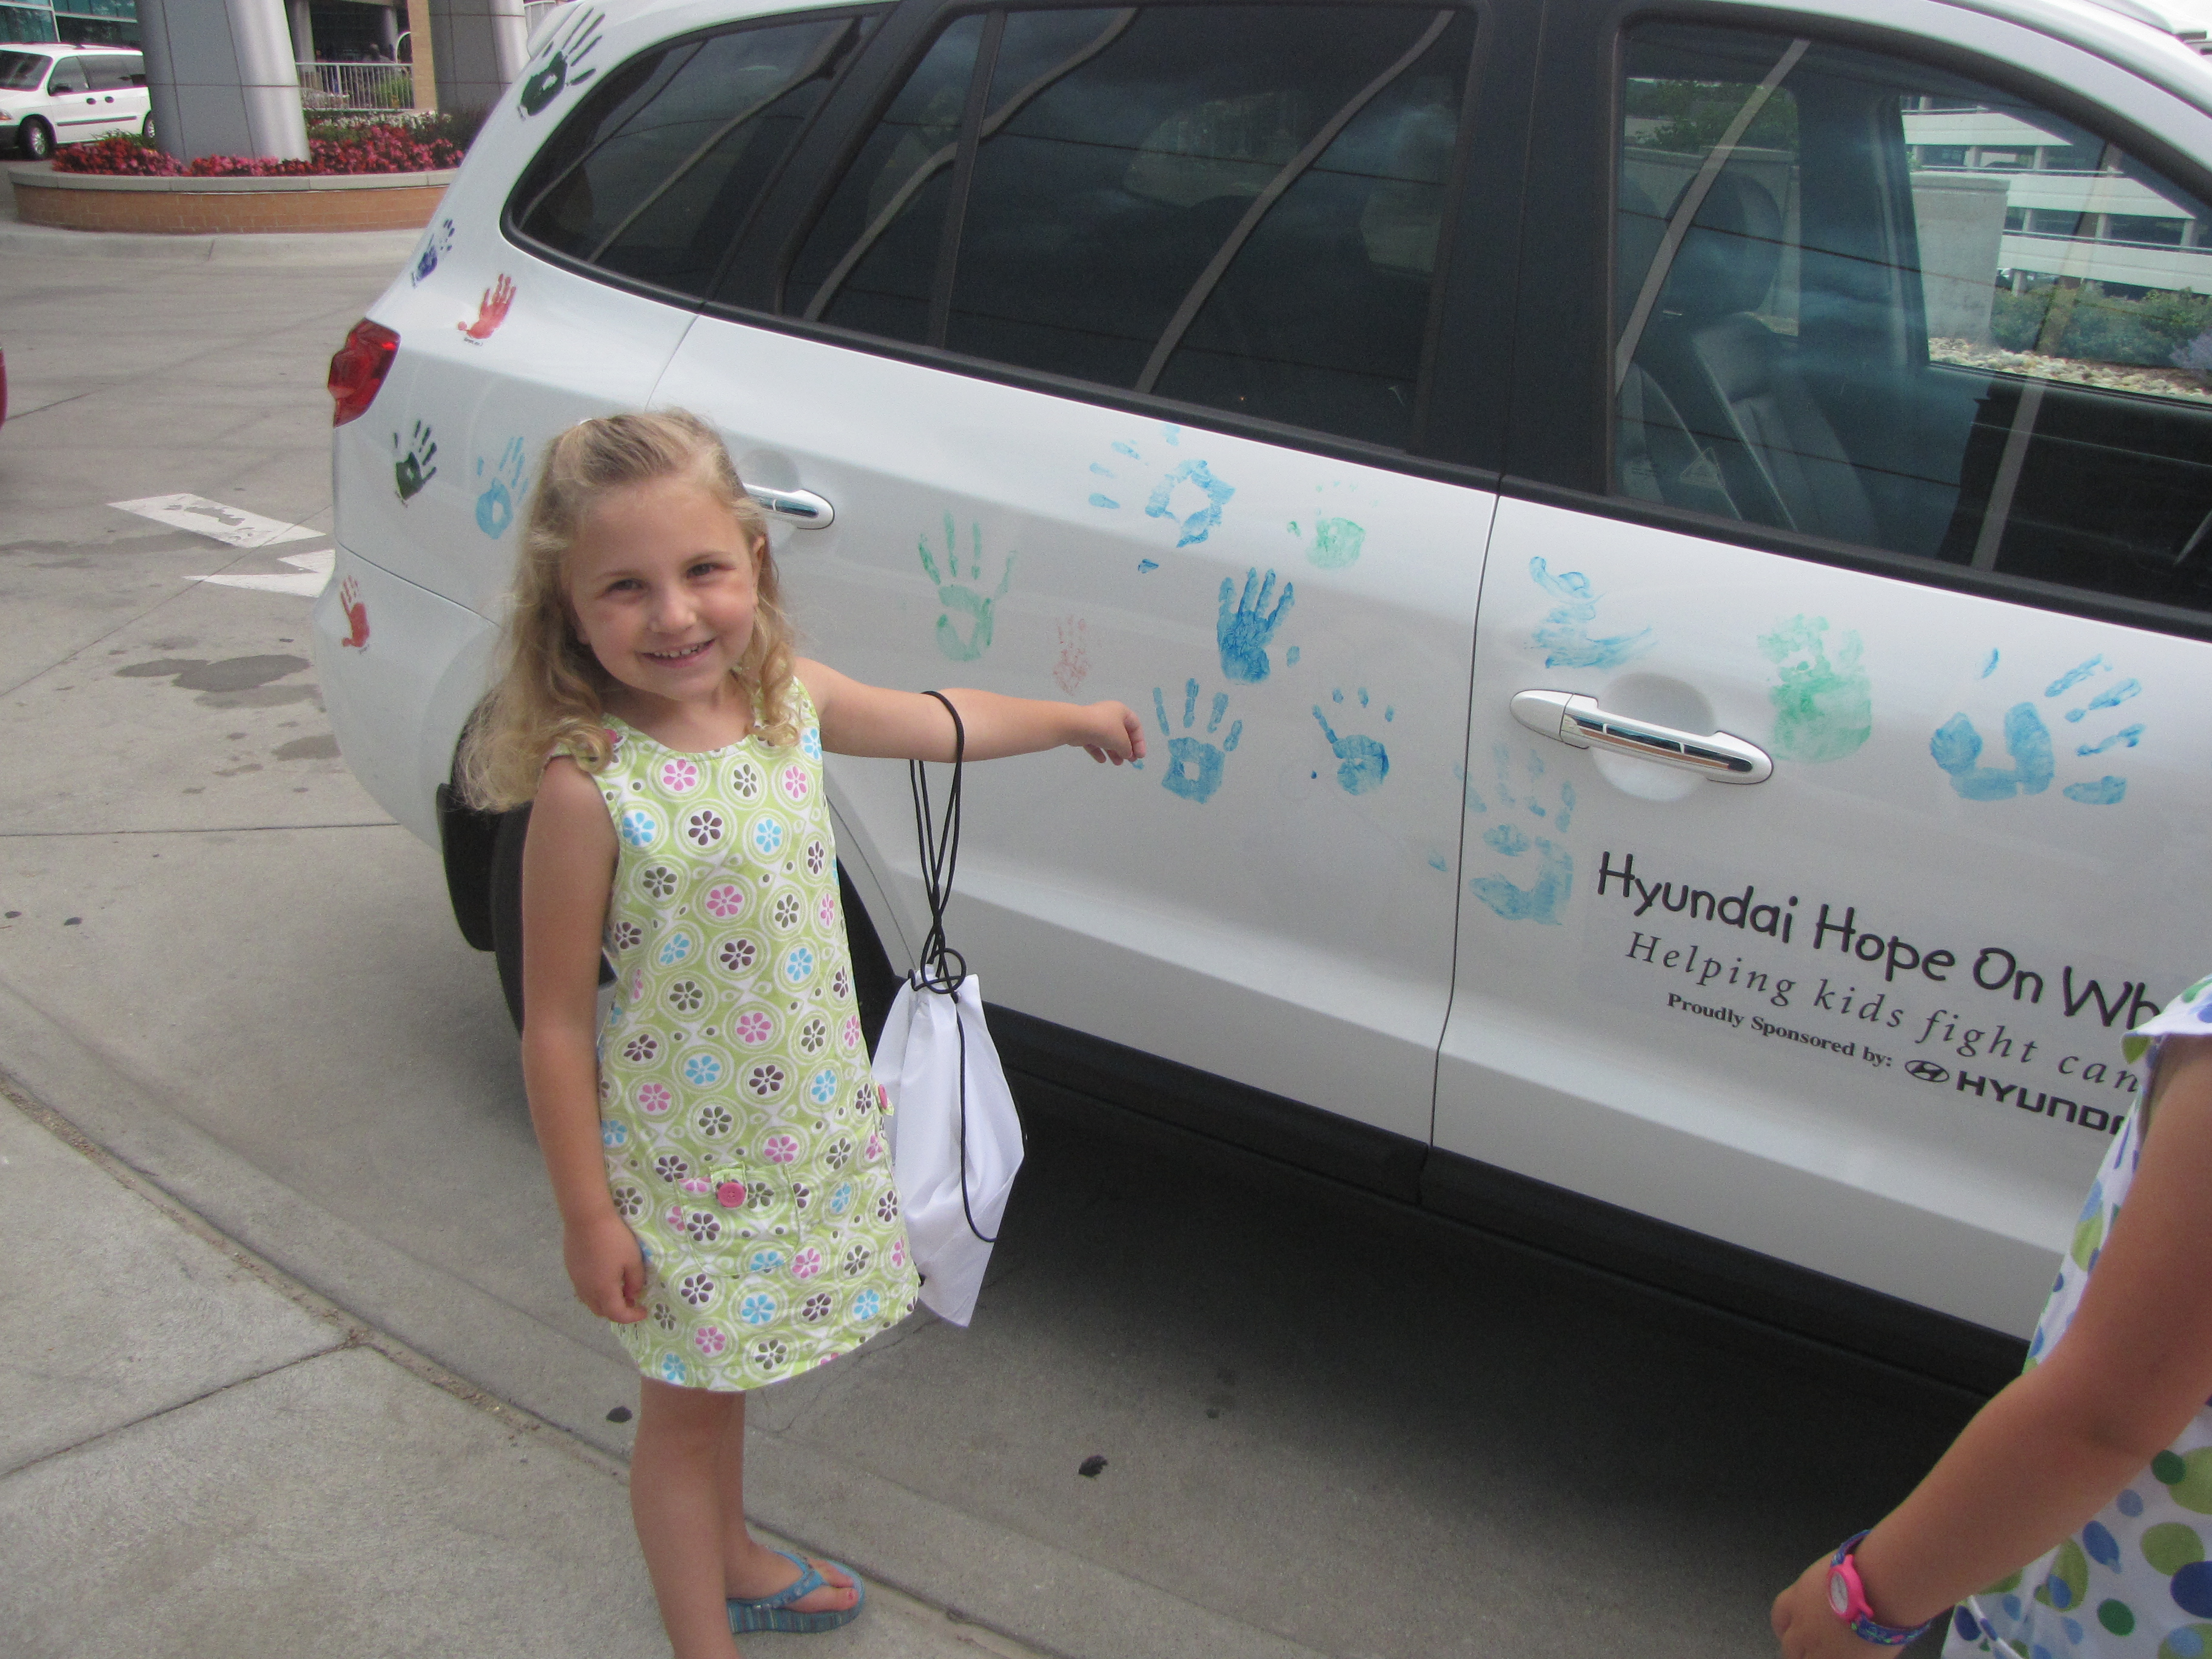 Sydney with her handprint at Hyundai Hope On Wheels